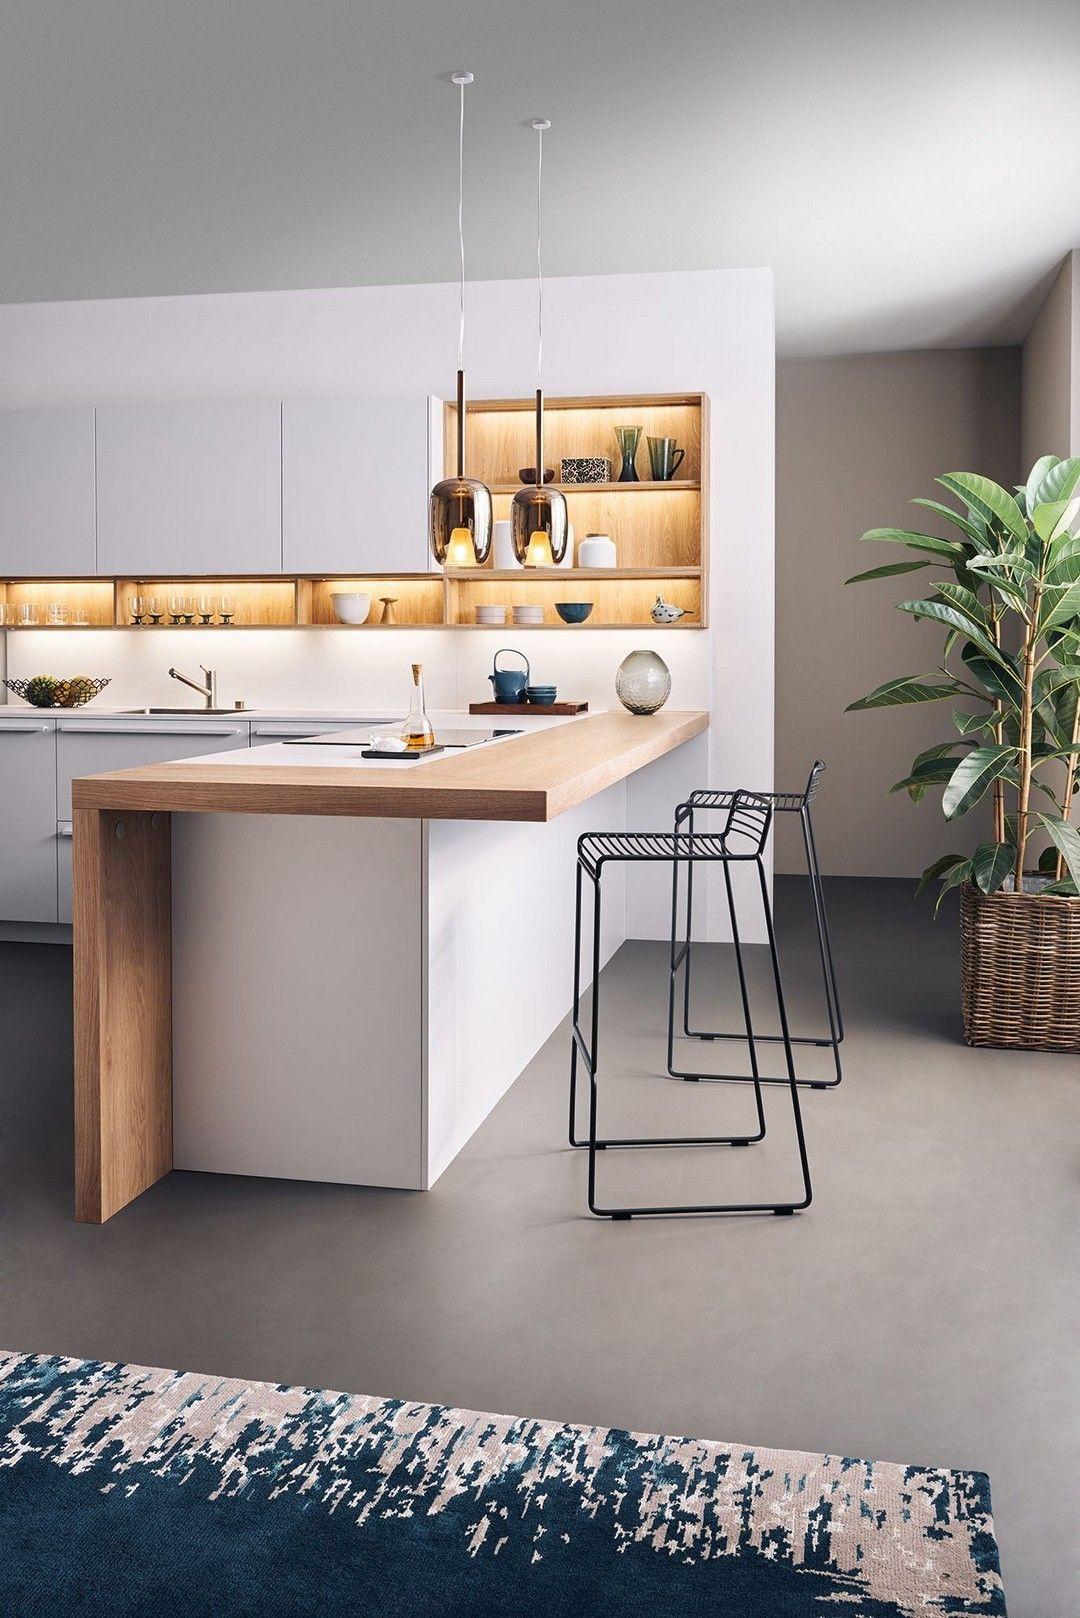 23 Kitchen Design That Invites Creativity #kitchen